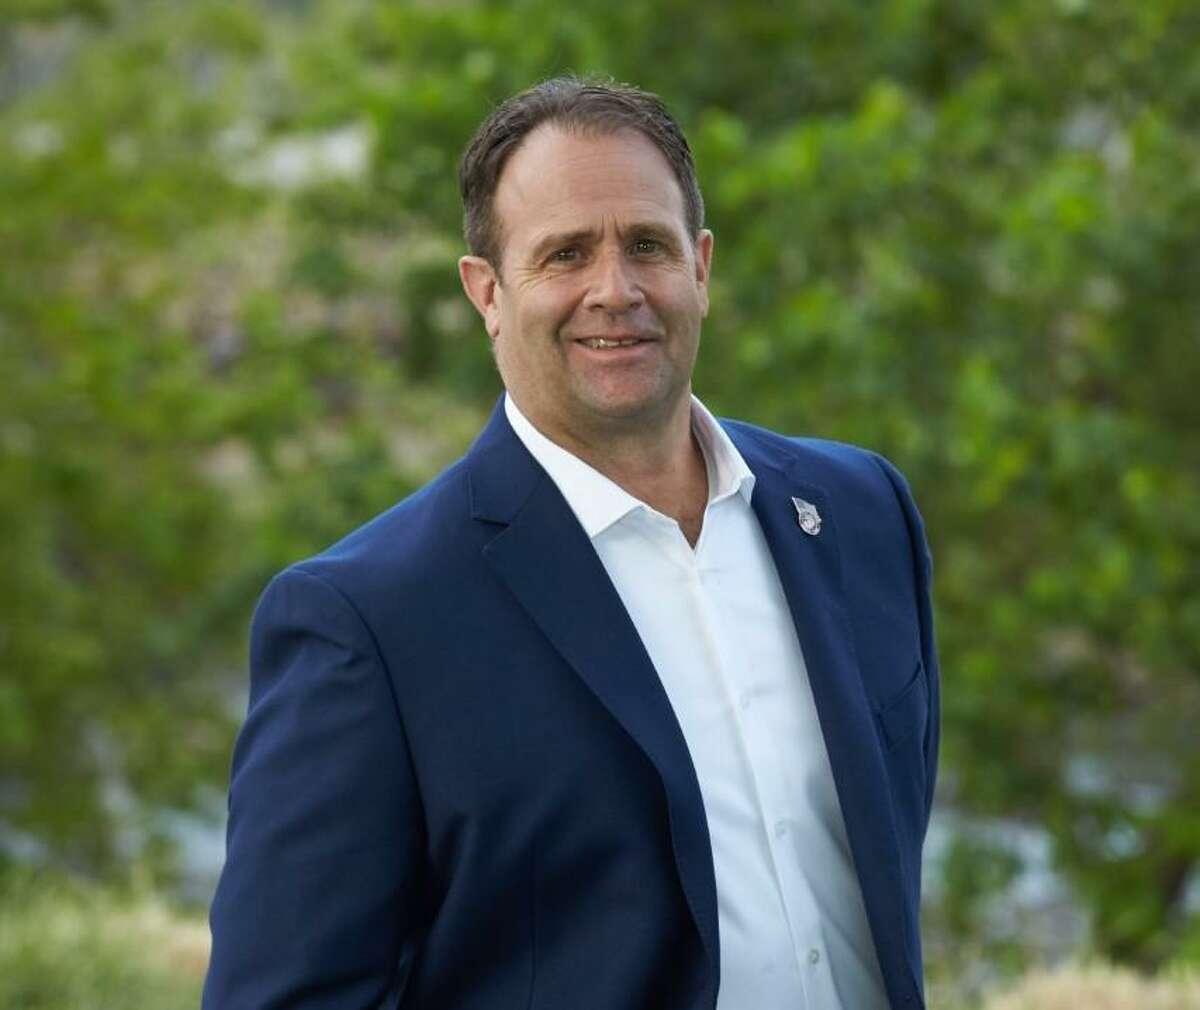 Longtime Shelton resident and retired police officer David Eldridge, a Democrat, is running against incumbent Republican Mayor Mark Lauretti this November.